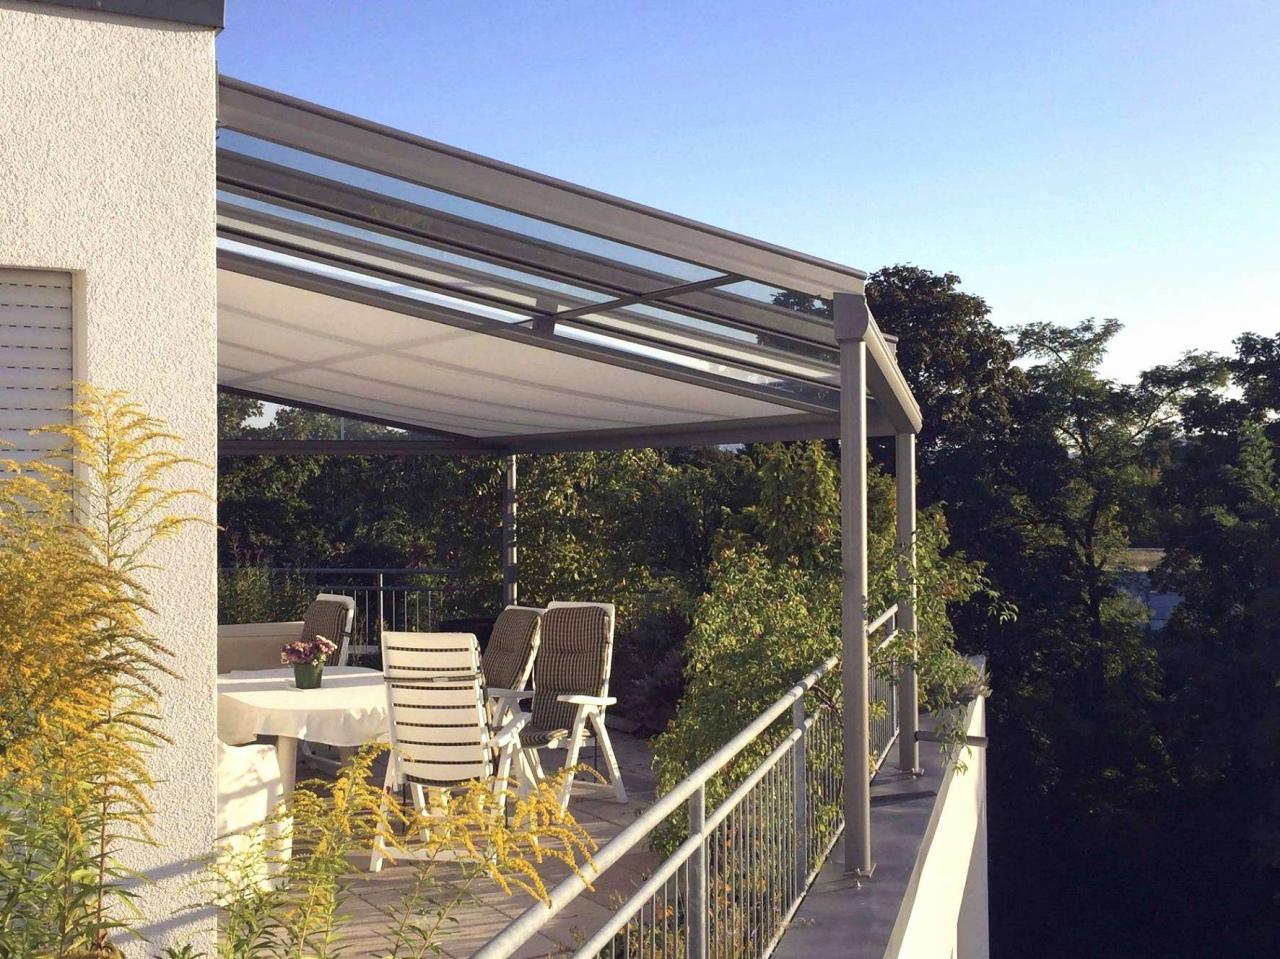 bamboo patio shades balkon bambus 2019 elegant schiebegardine bambusart 0d fur balkon durch bamboo patio shades